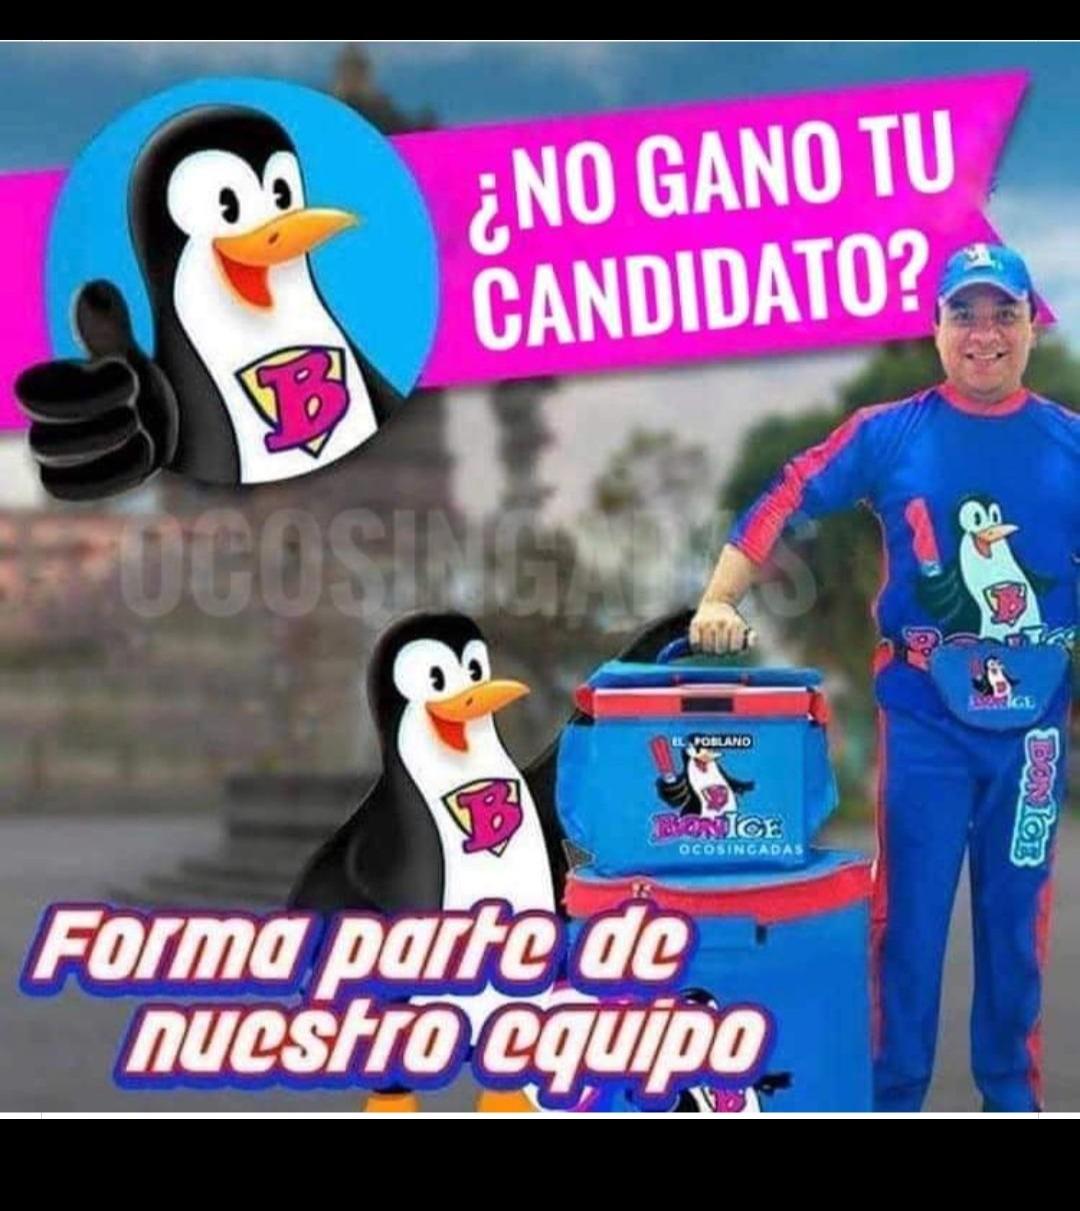 Votaciones México 2021 se acabaron - meme